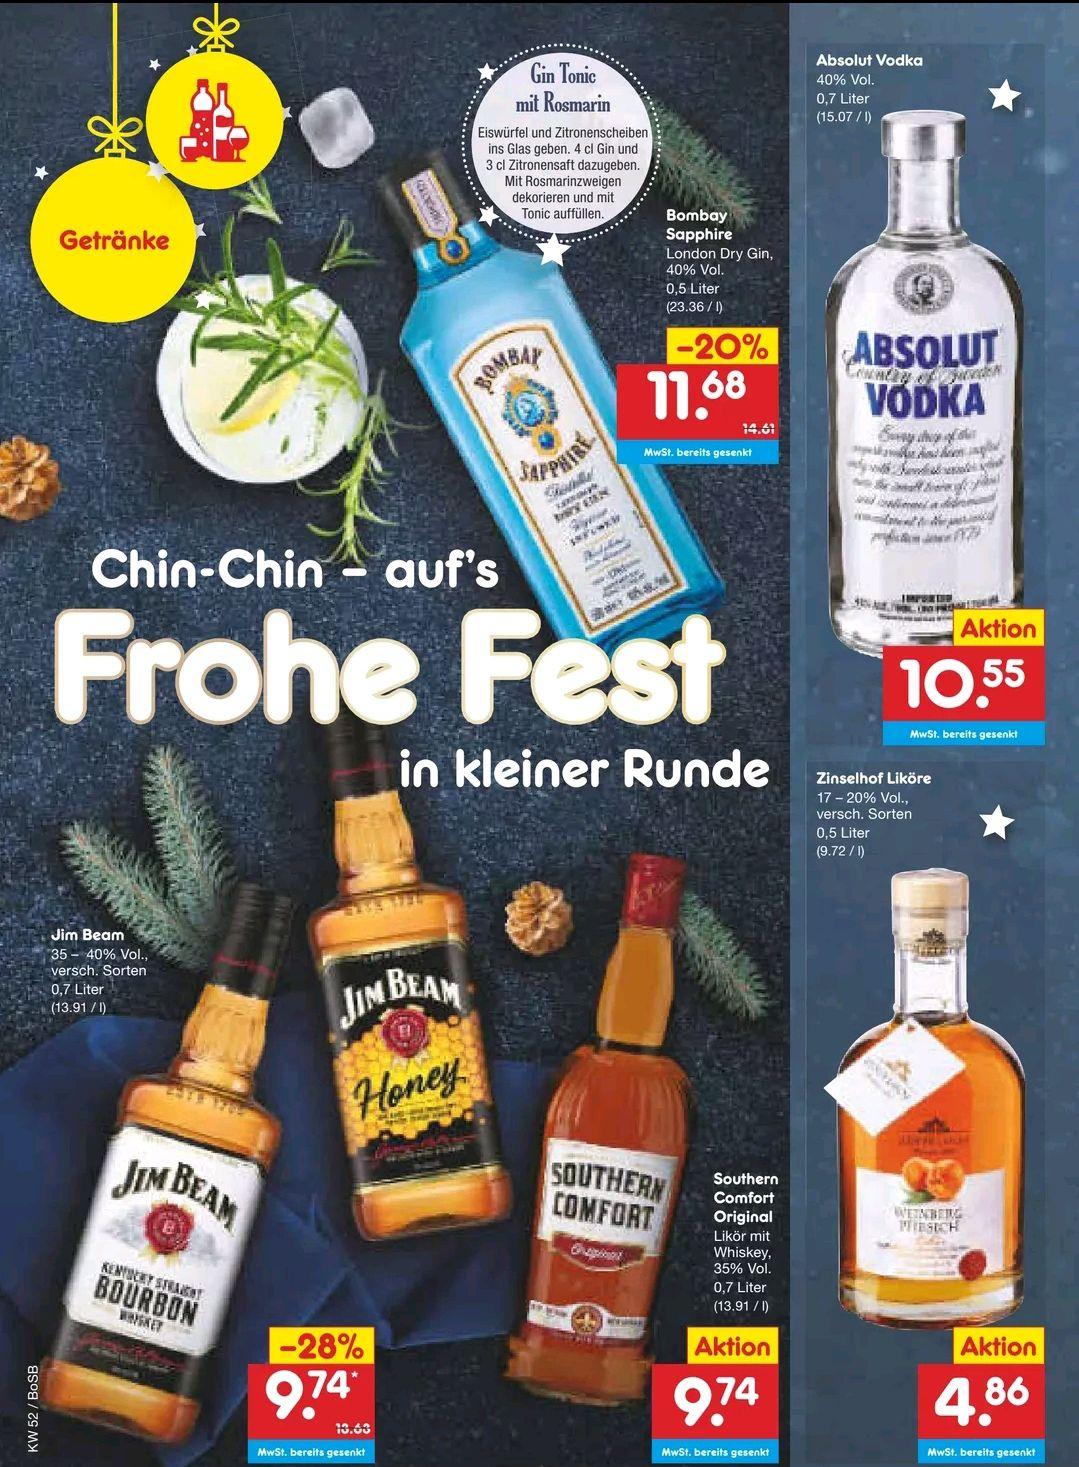 [Netto MD] Jim Beam Southern Comfort Absolut Vodka und Bombay Sapphire zum Bestpreis dank Coupons